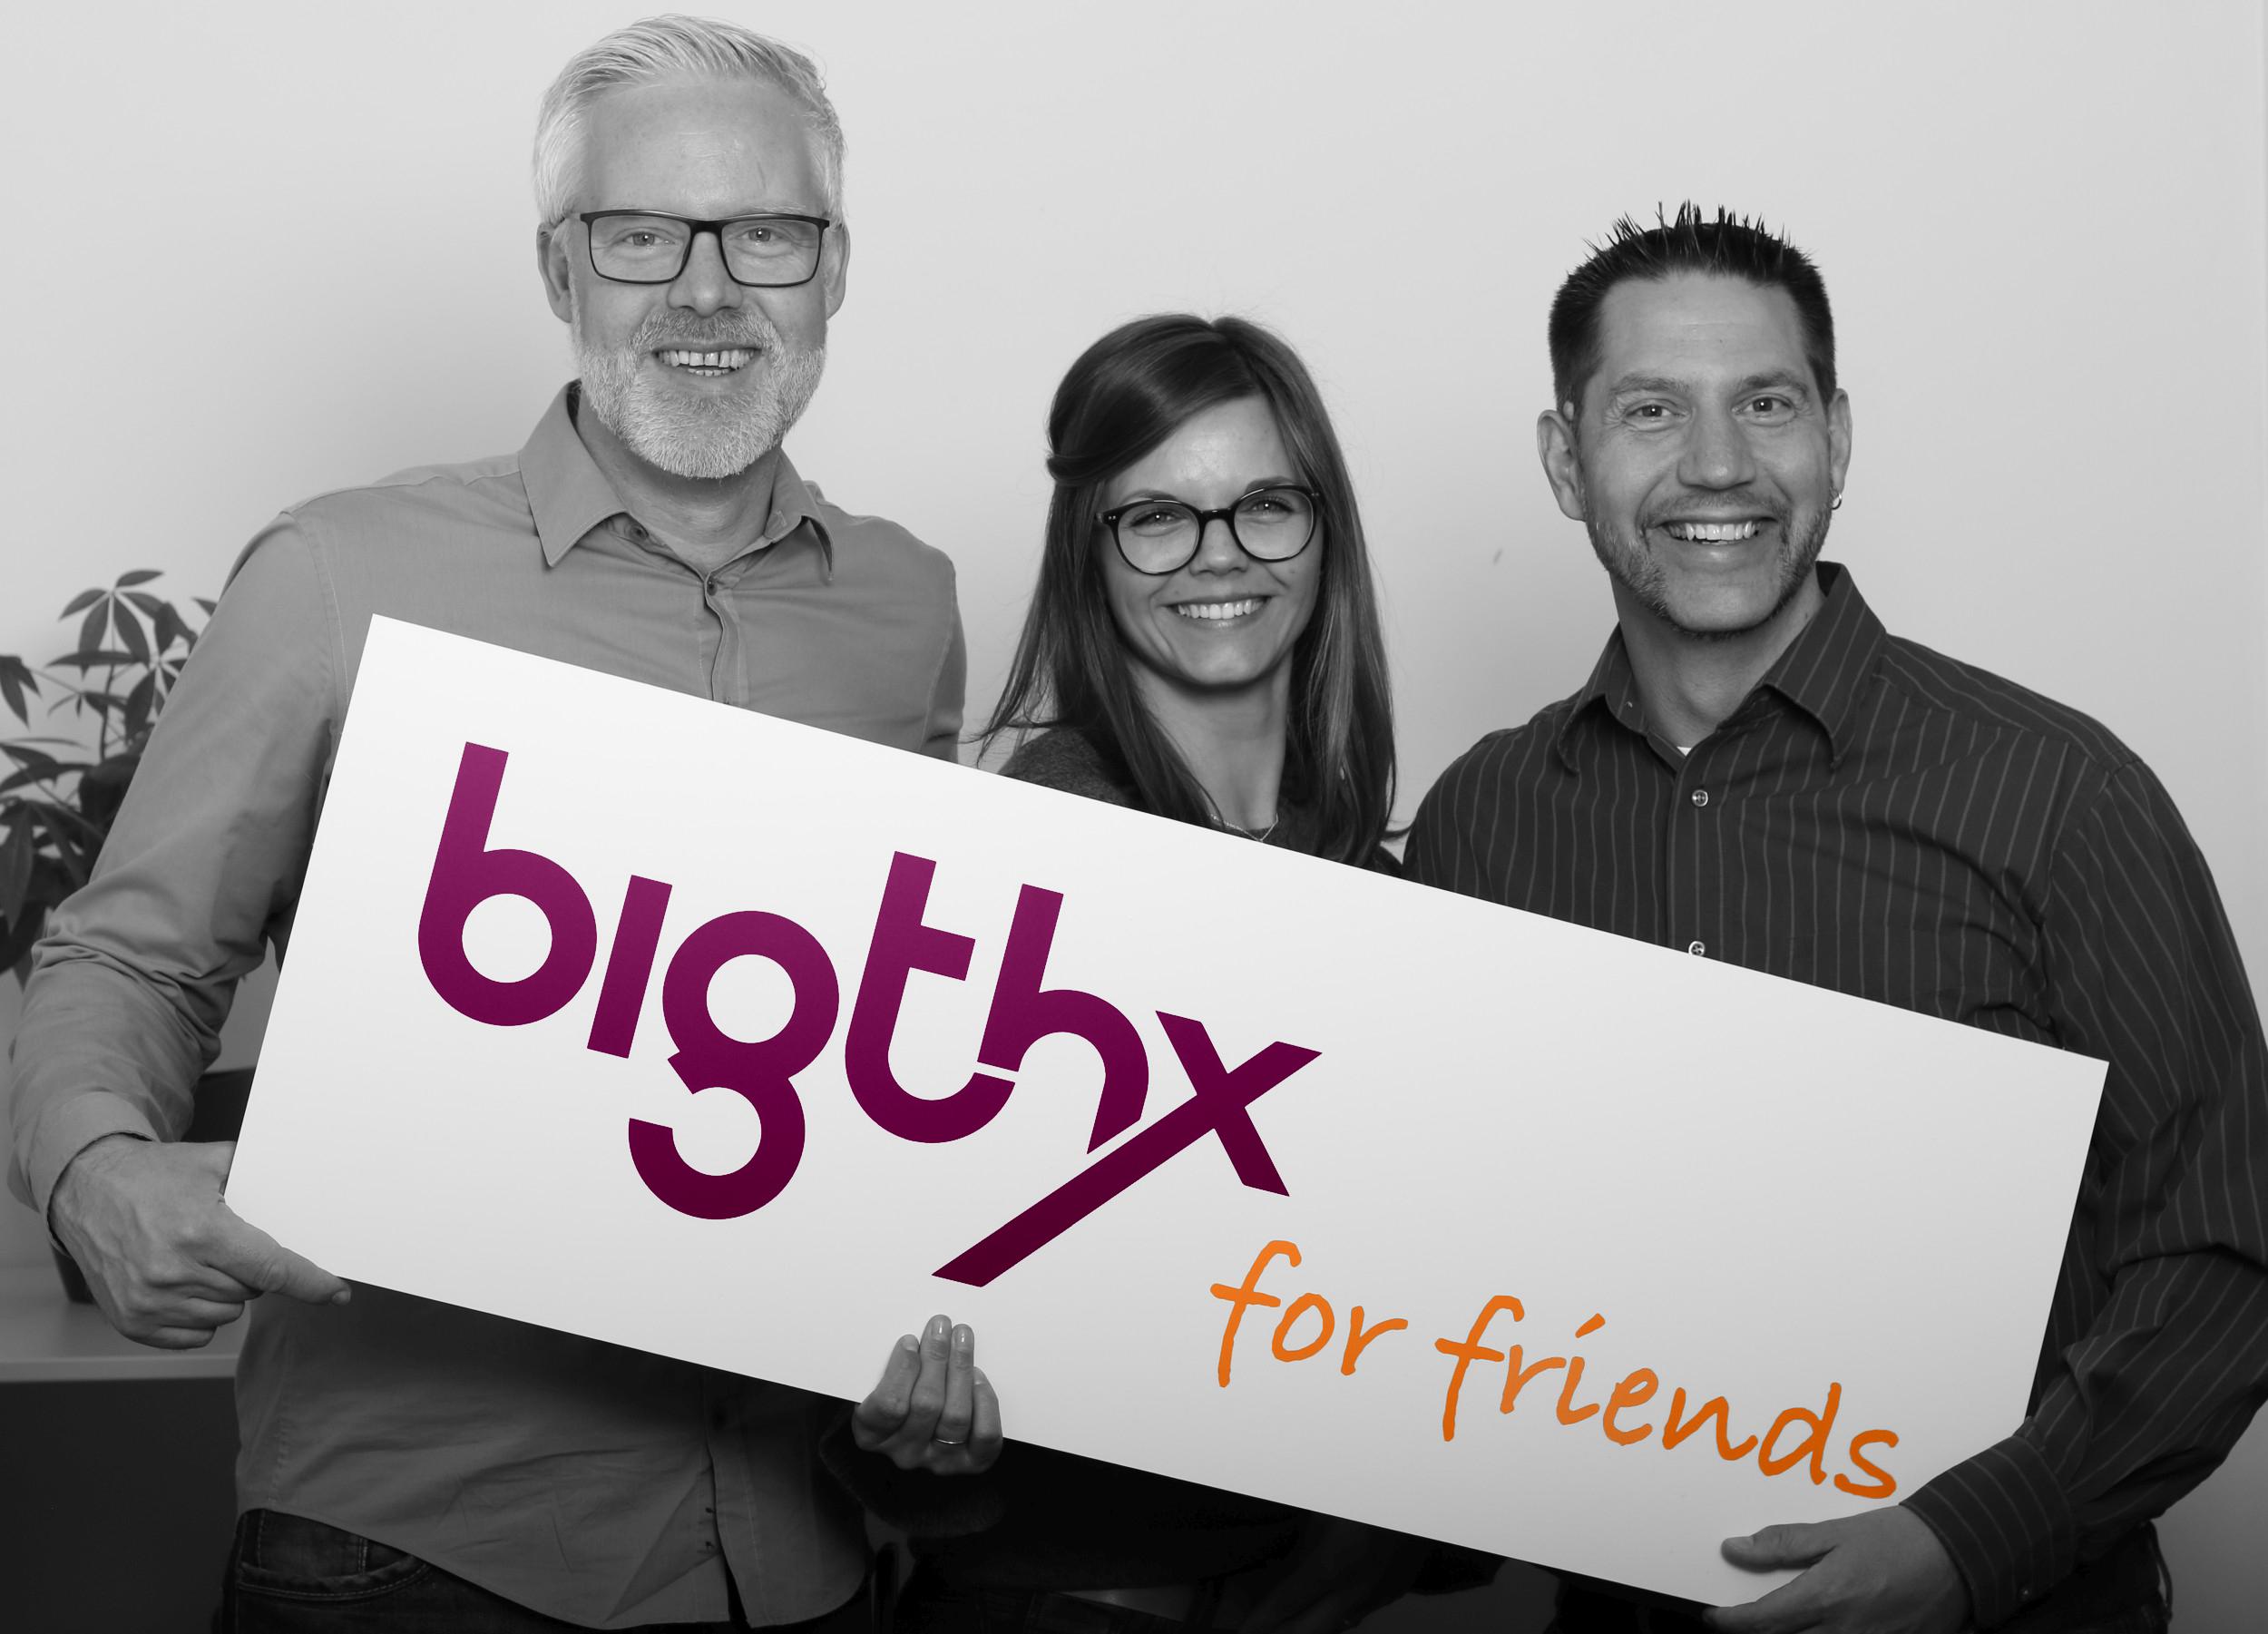 Wir_bigthx-for-friends02